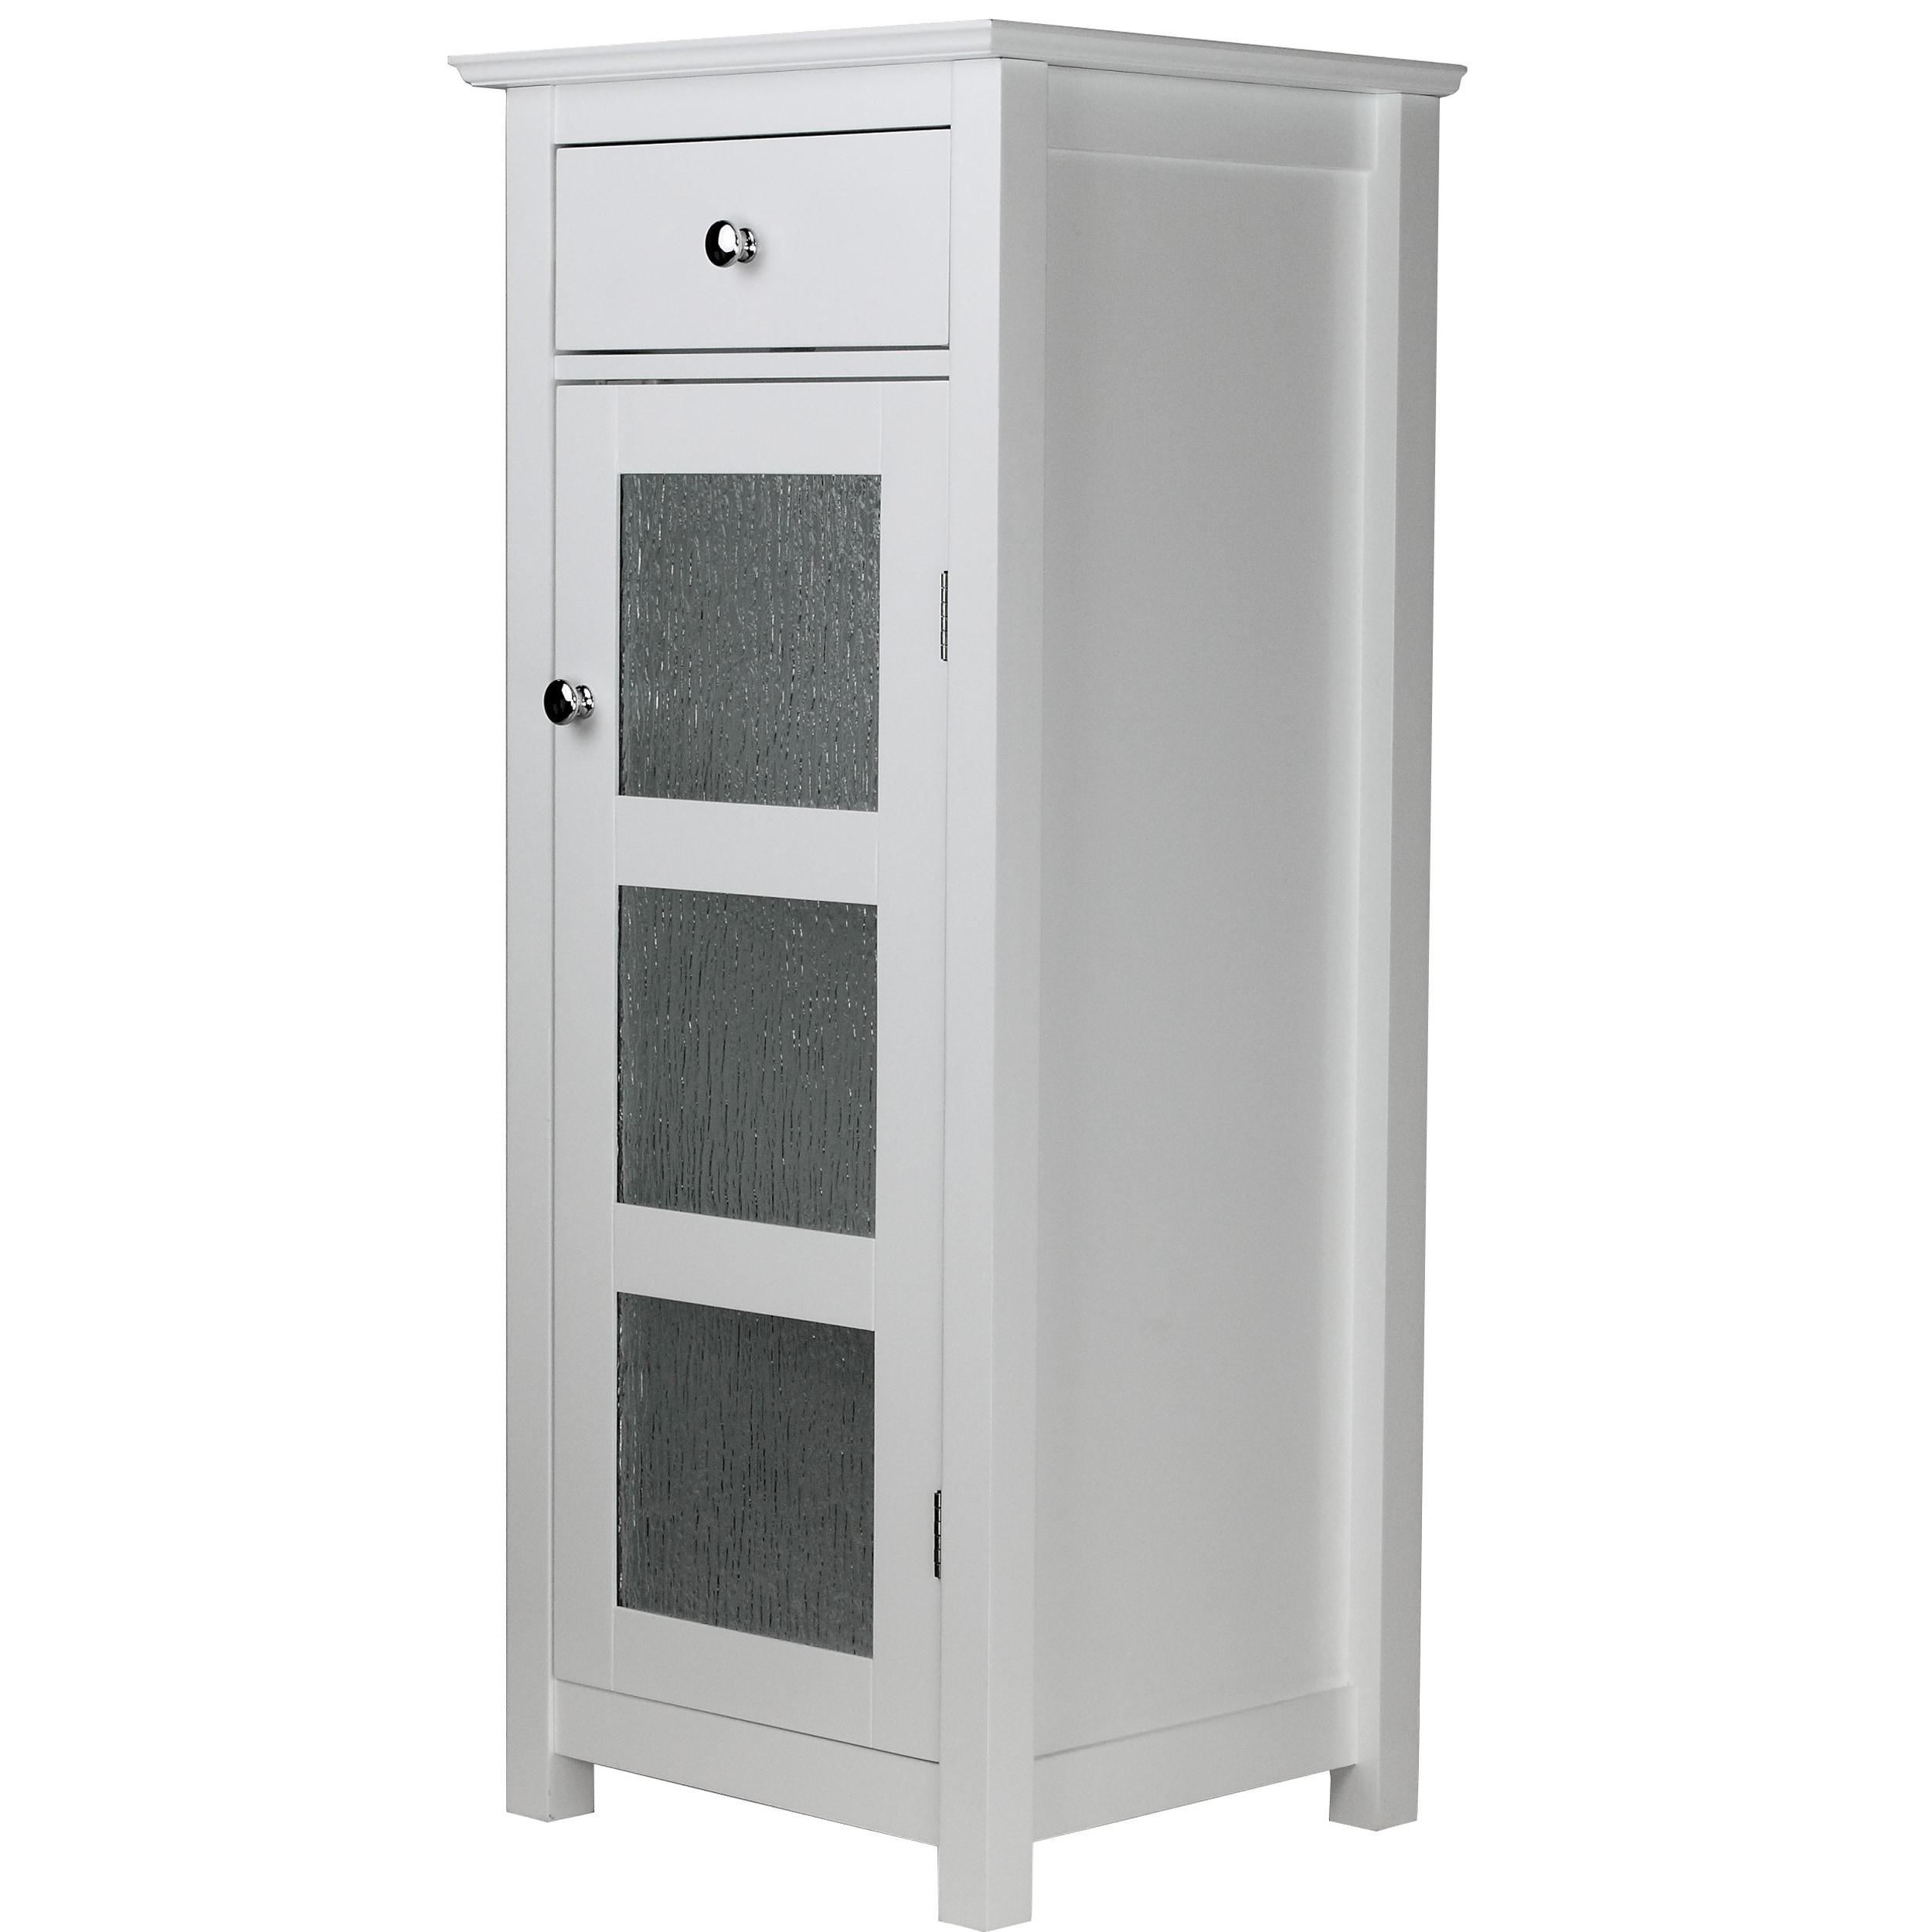 Wood Floor Cabinet Bathroom Cabinets Storage Online At Our Best Furniture Deals